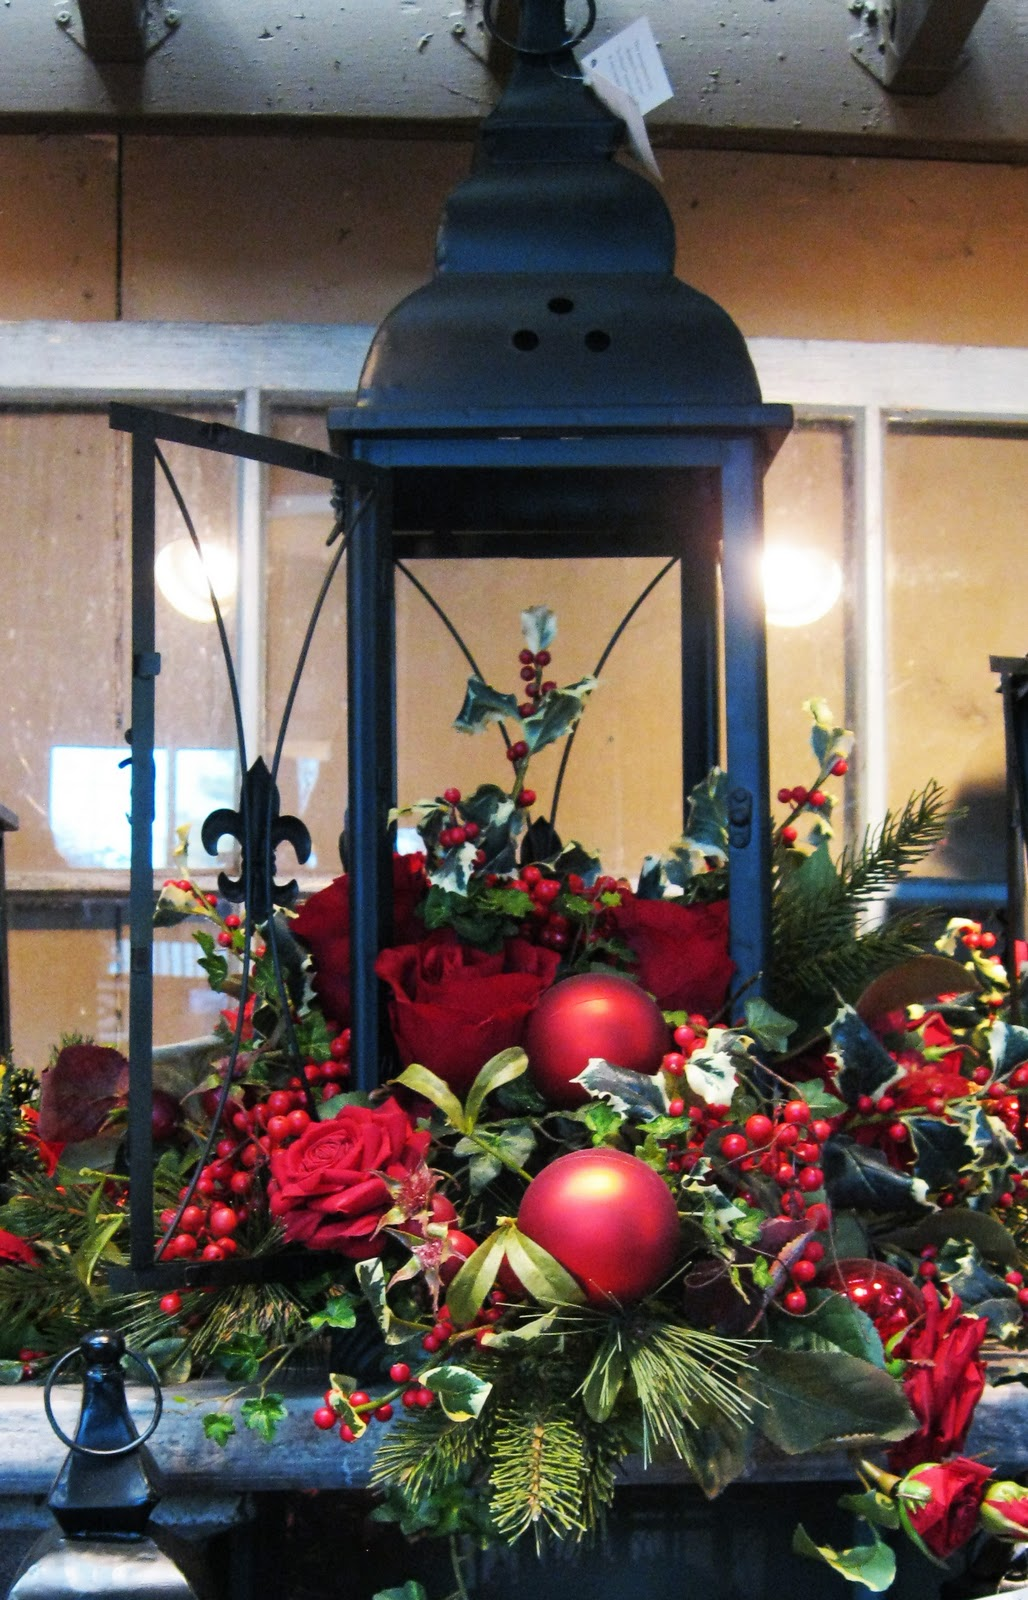 CBID HOME DECOR And DESIGN CHRISTMAS IS COMING